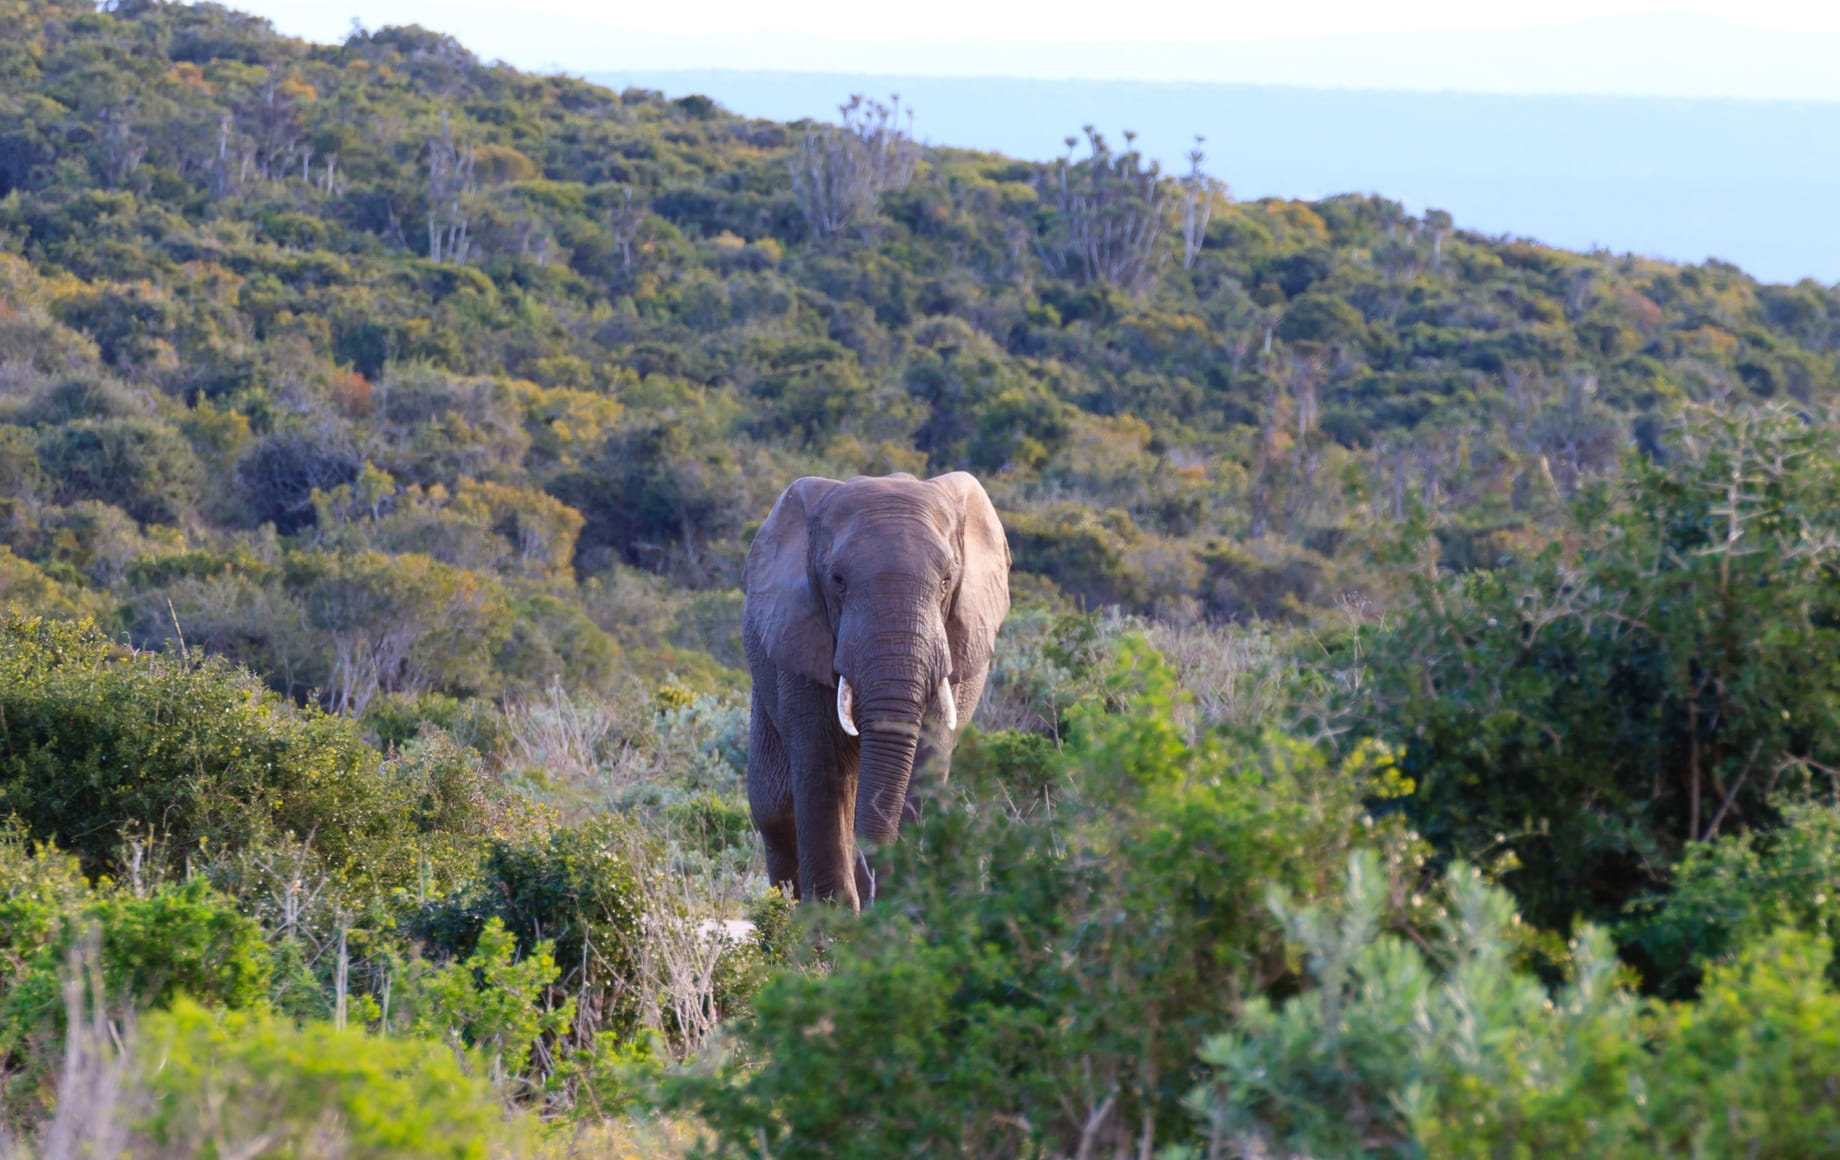 Elephant in Eastern Cape